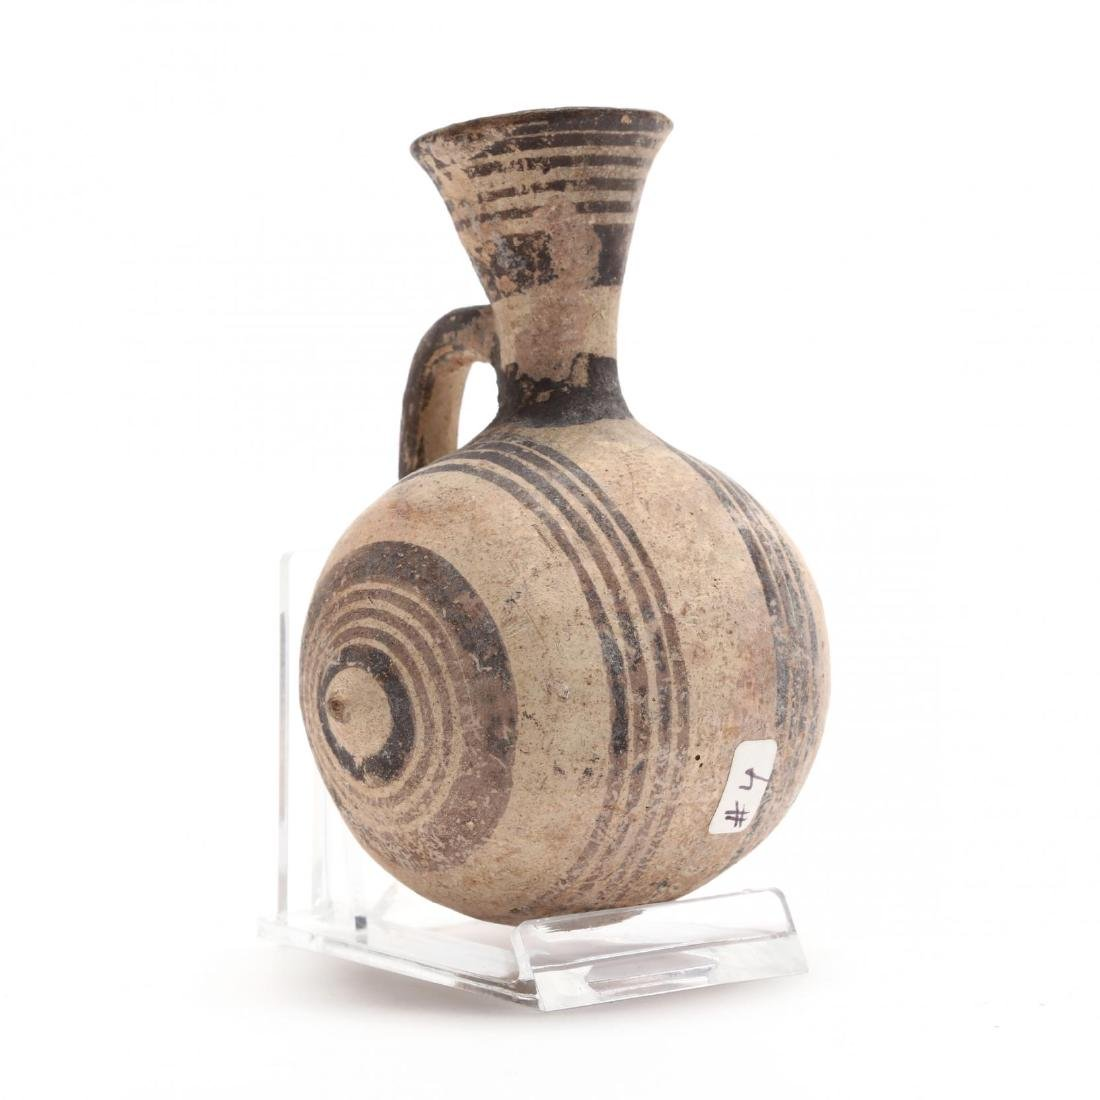 Diminutive Cypro-Geometric Barrel Jug